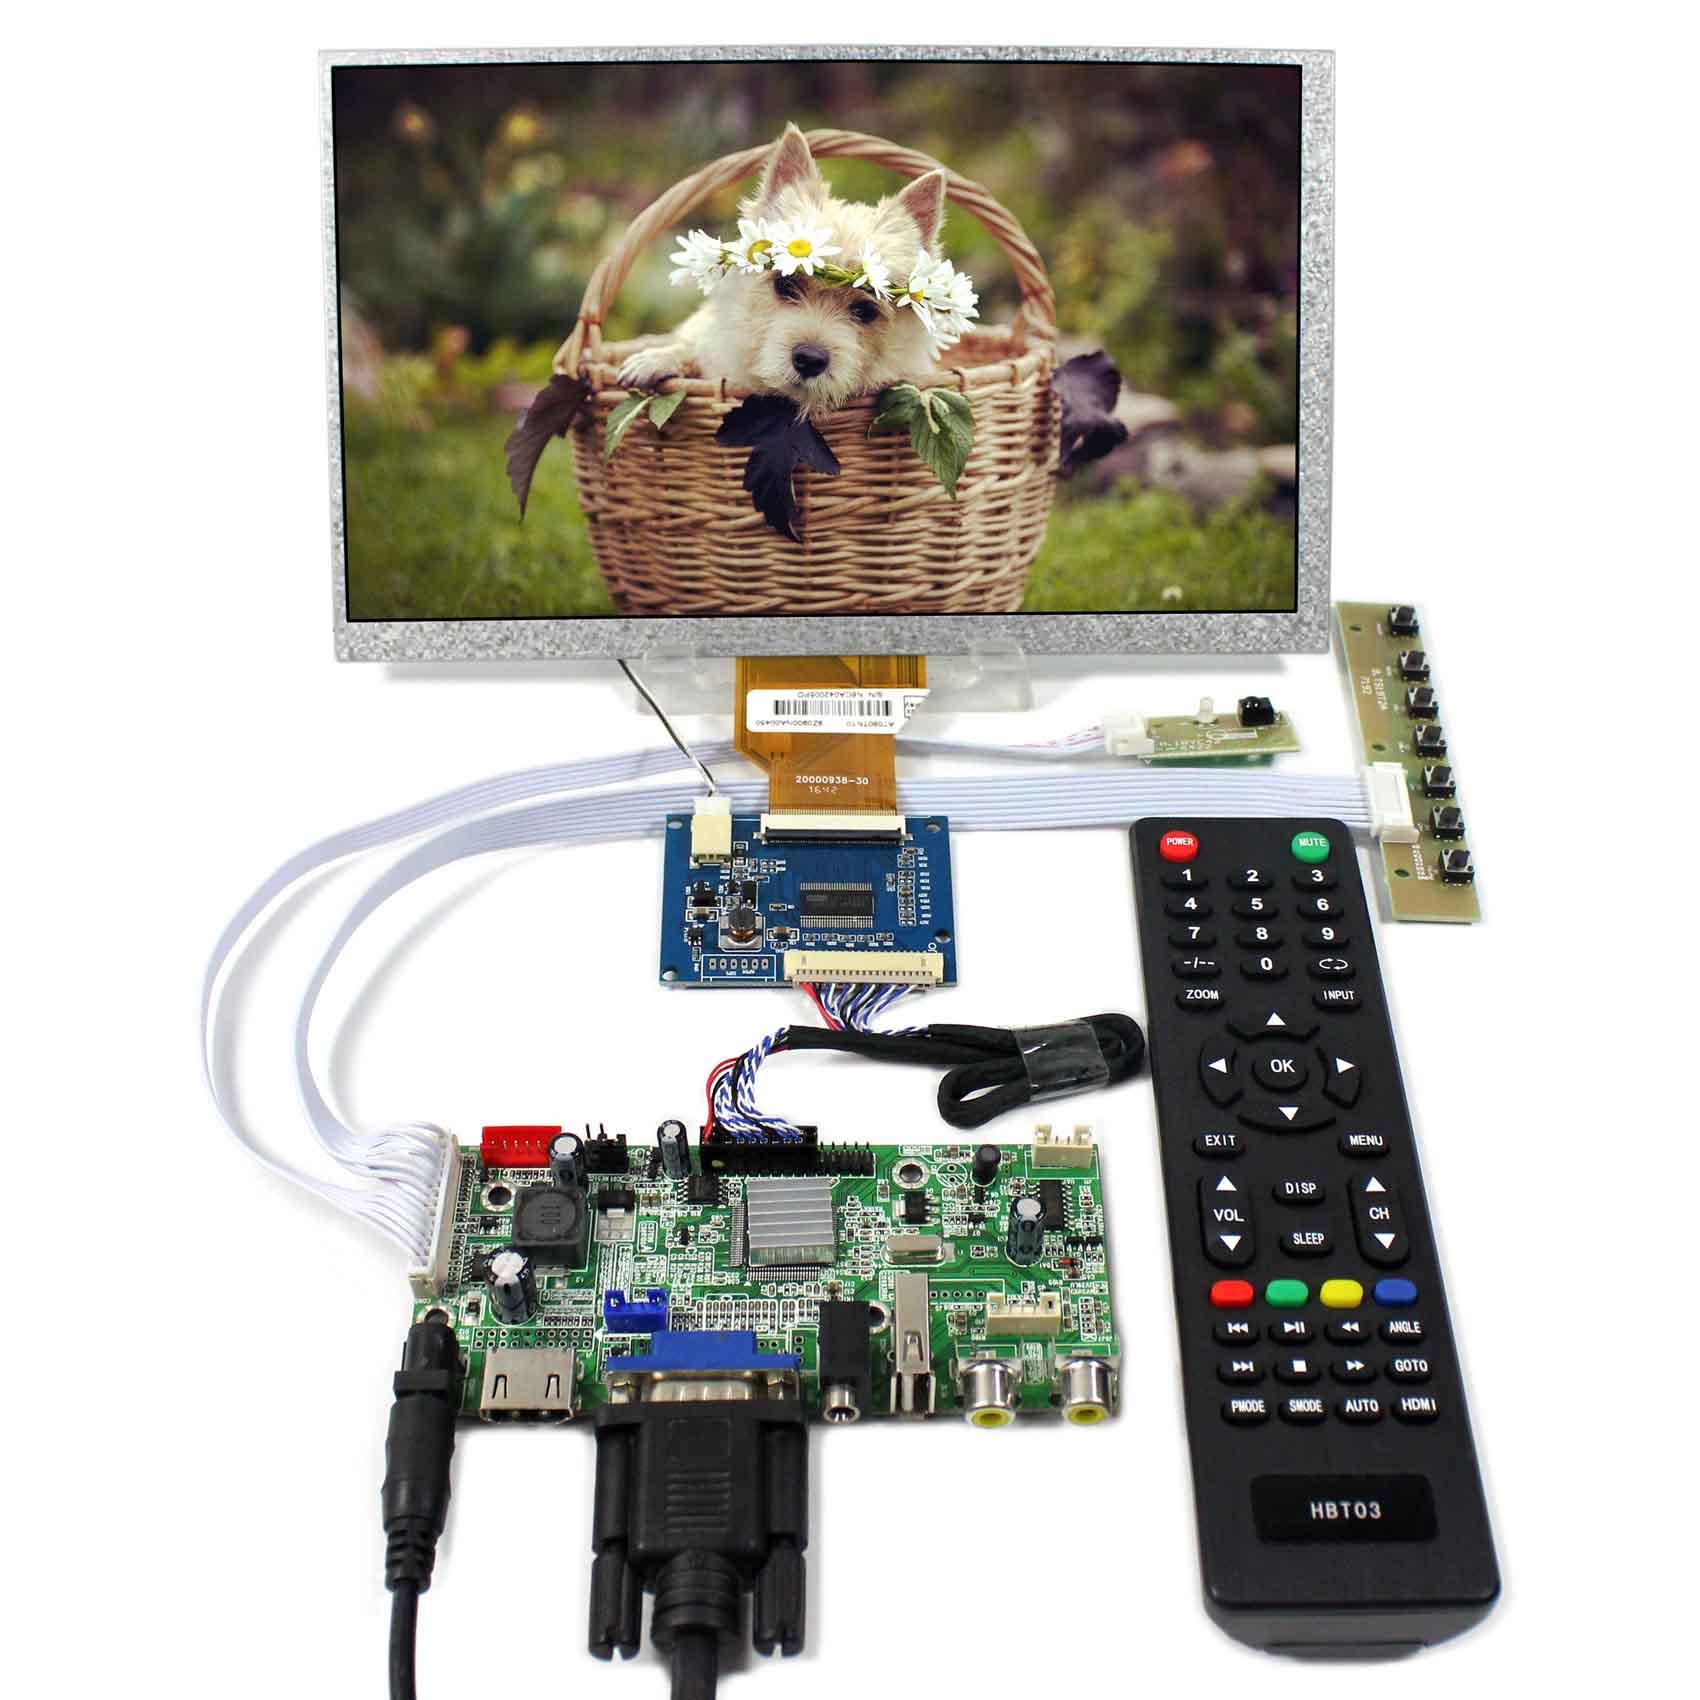 HDMI+VGA+AV+Audio+USB LCD Controller Board With 9inch 800x480 AT090TN10 LCD Screen hdmi vga av audio usb fpv controller board 8 9inch hsd089ifw1 1024x600 lcd panel touch panel screen model lcd for raspberry pi